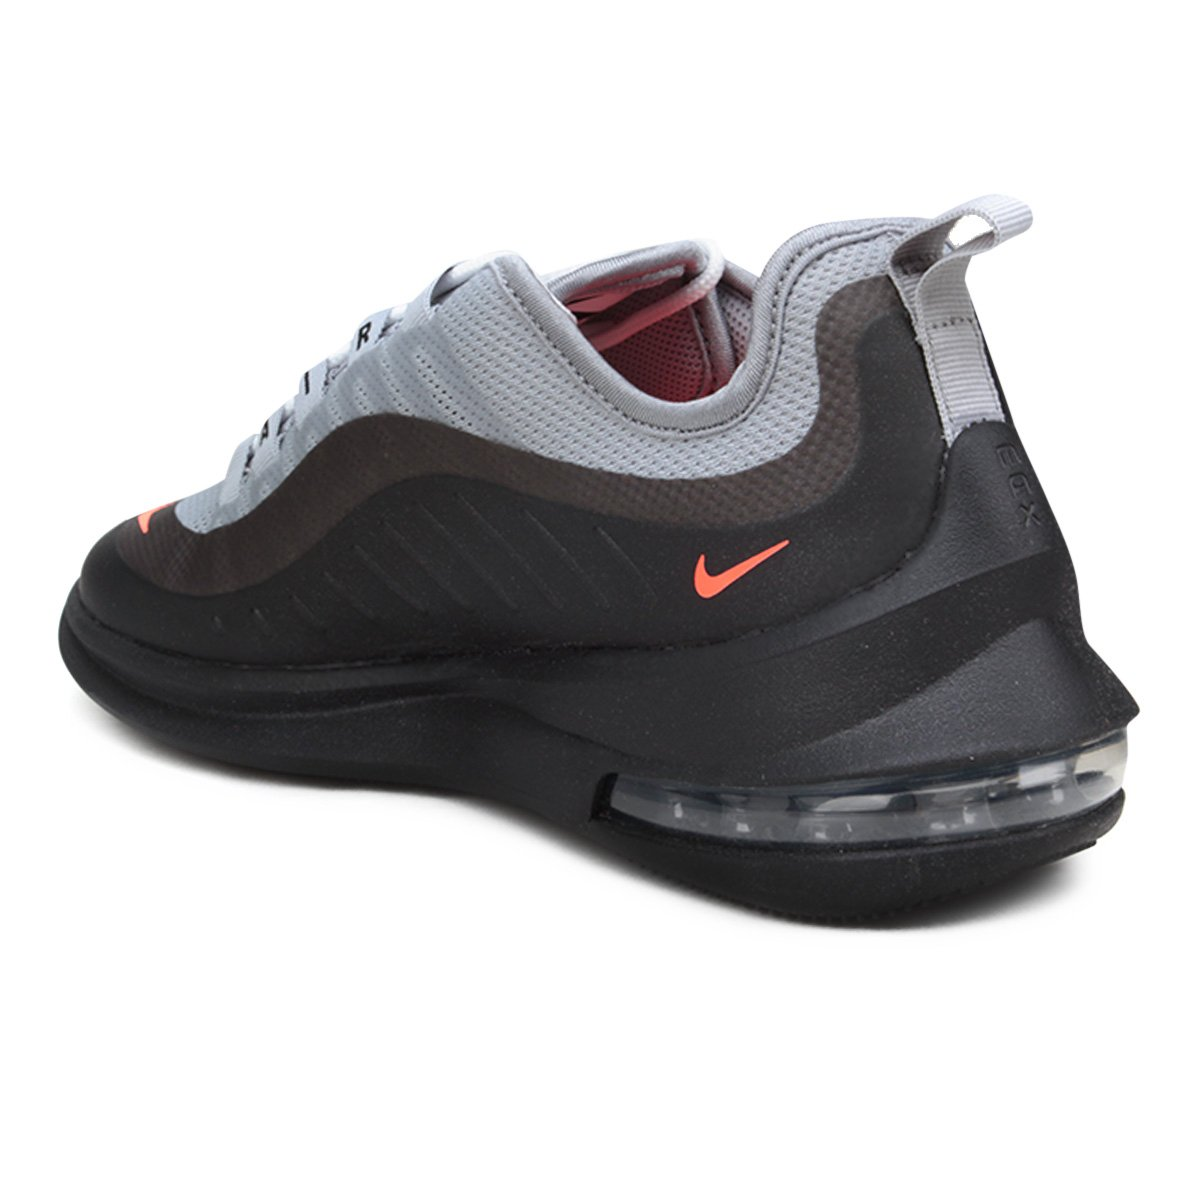 Tênis Nike Air Max Axis - Cinza e Preto - Compre Agora  b700d28ea5a2a